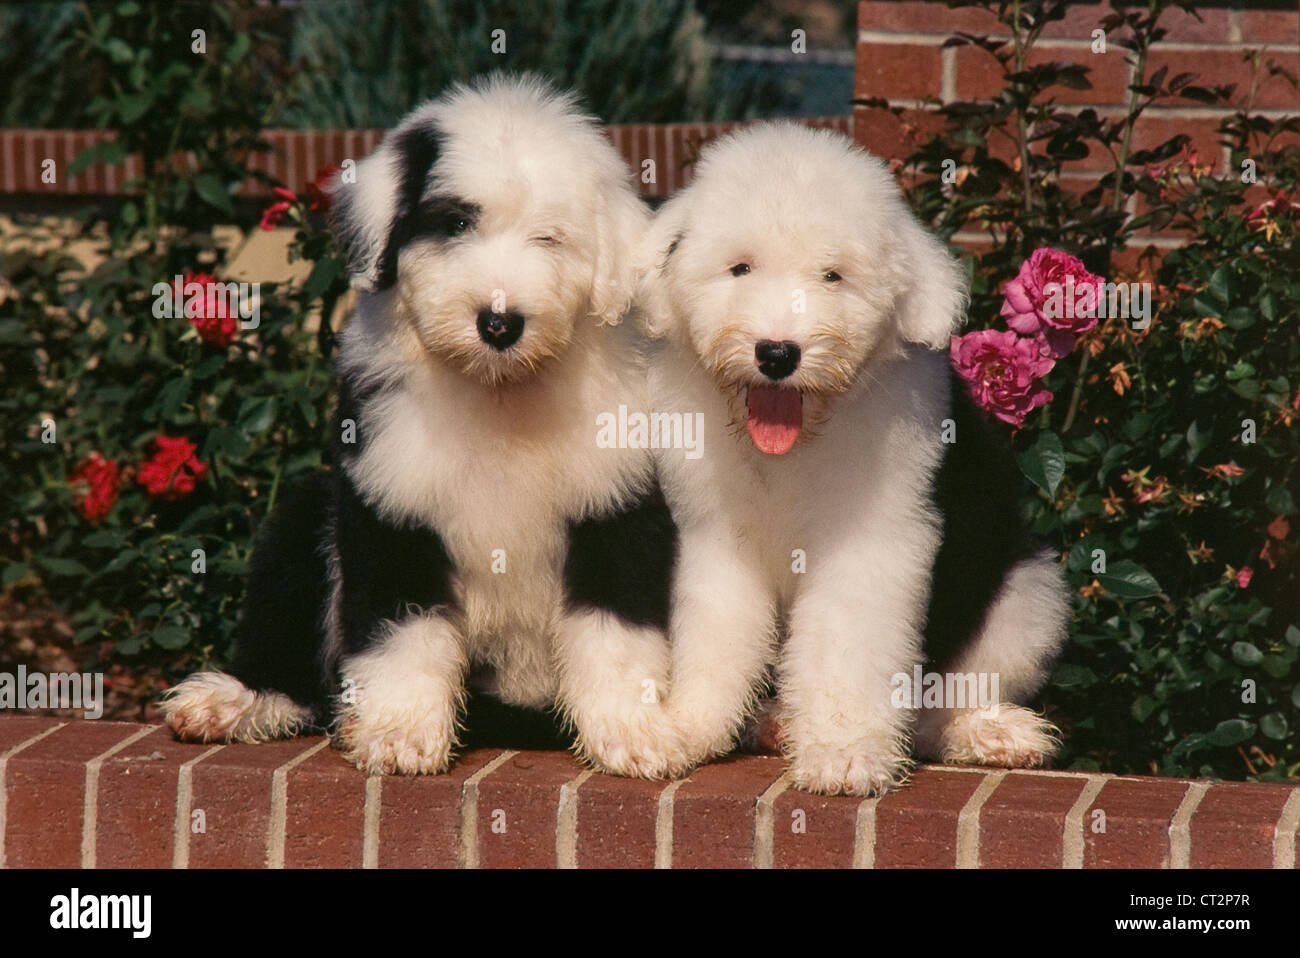 Black And White Sheepdog Stock Photos & Black And White